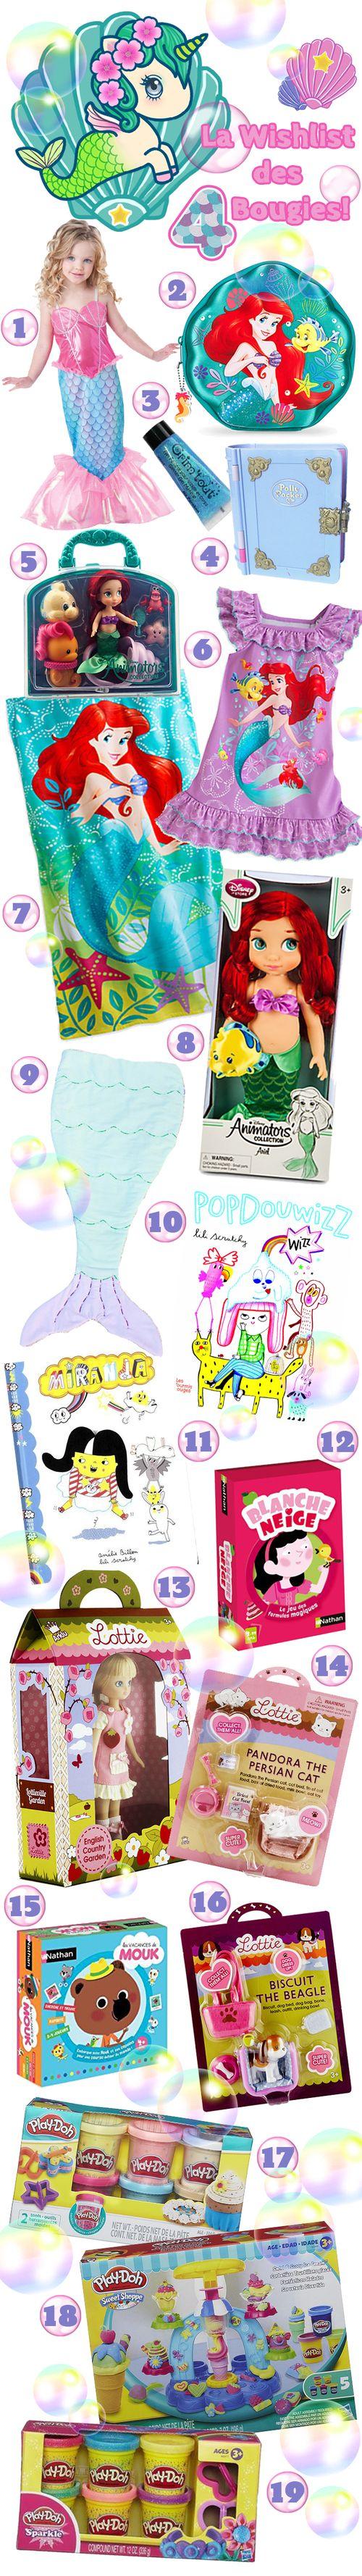 Wishlist-BirthdayGirl-4-ans-idee-cadeaux